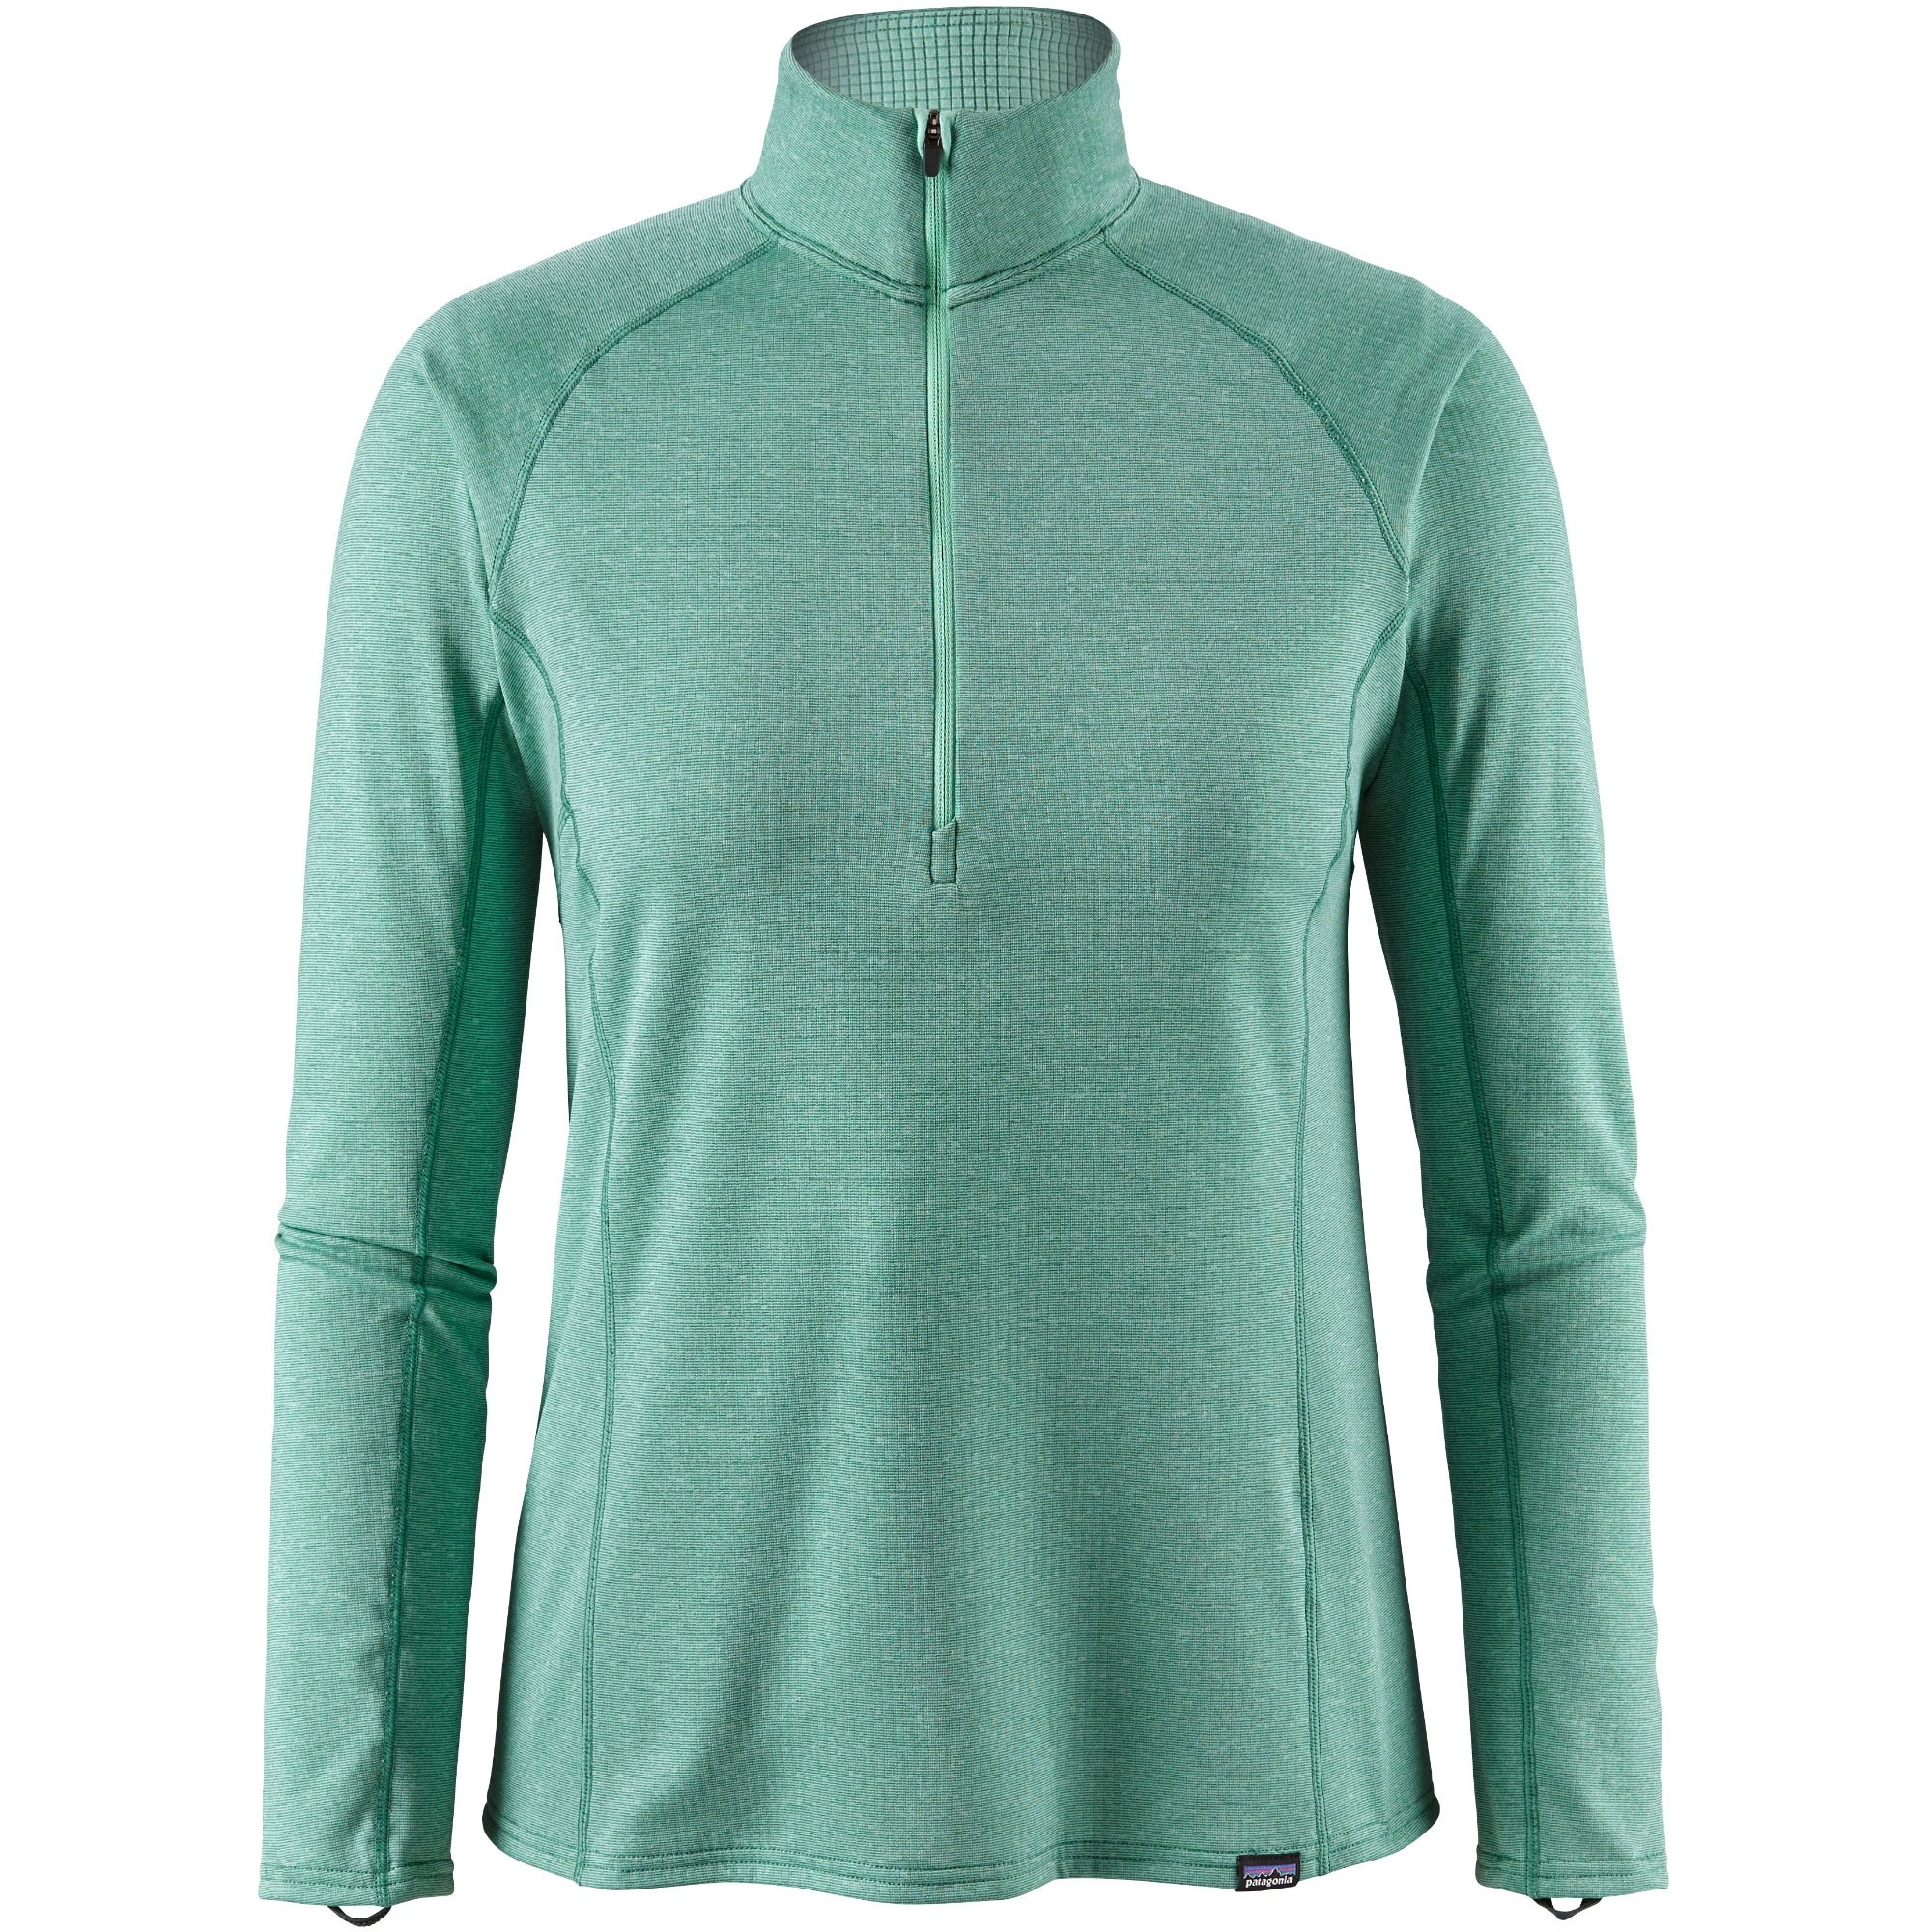 Patagonia Capilene Midweight Women's Zip-Neck - Vjosa Green/Beryl Green X-Dye